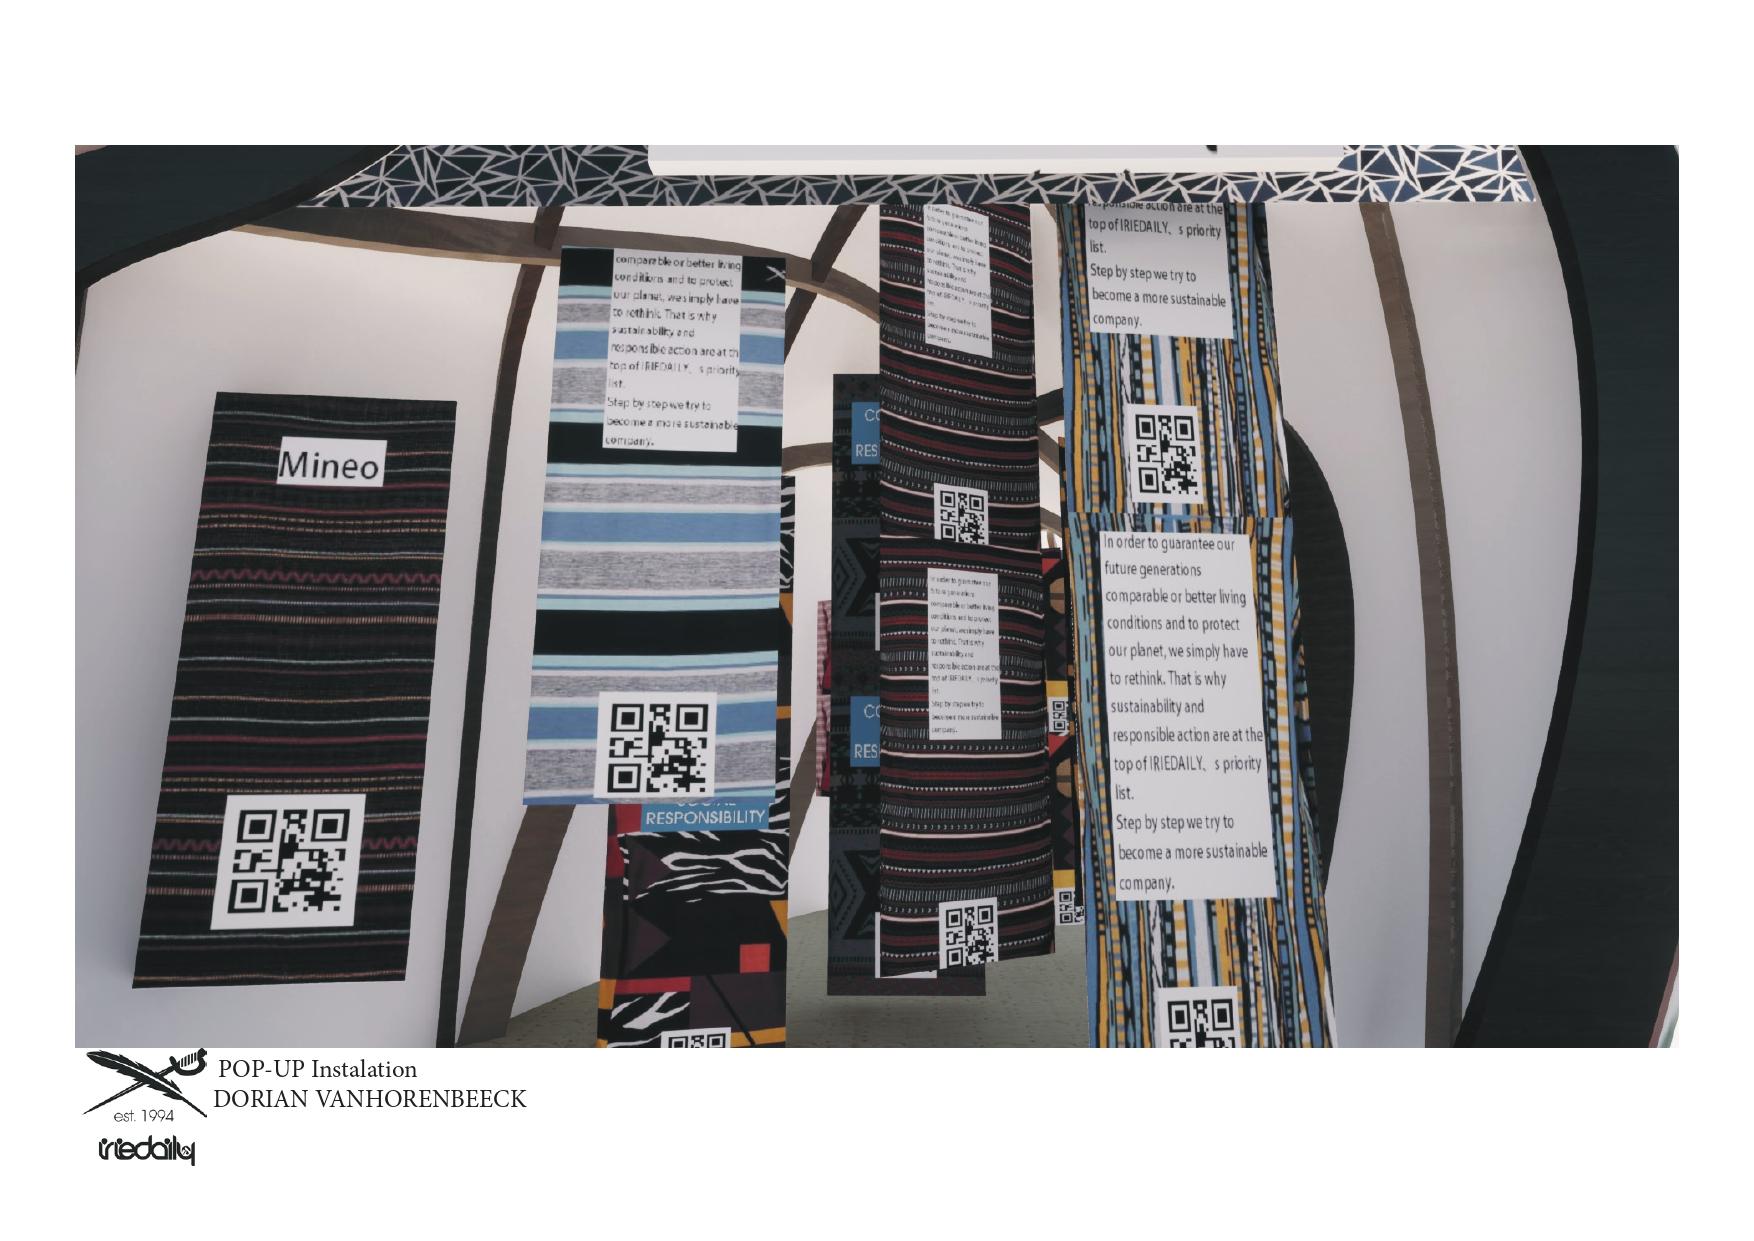 Exam18-01-21 Pre Dorian Vanhorenbeeck_page-0010